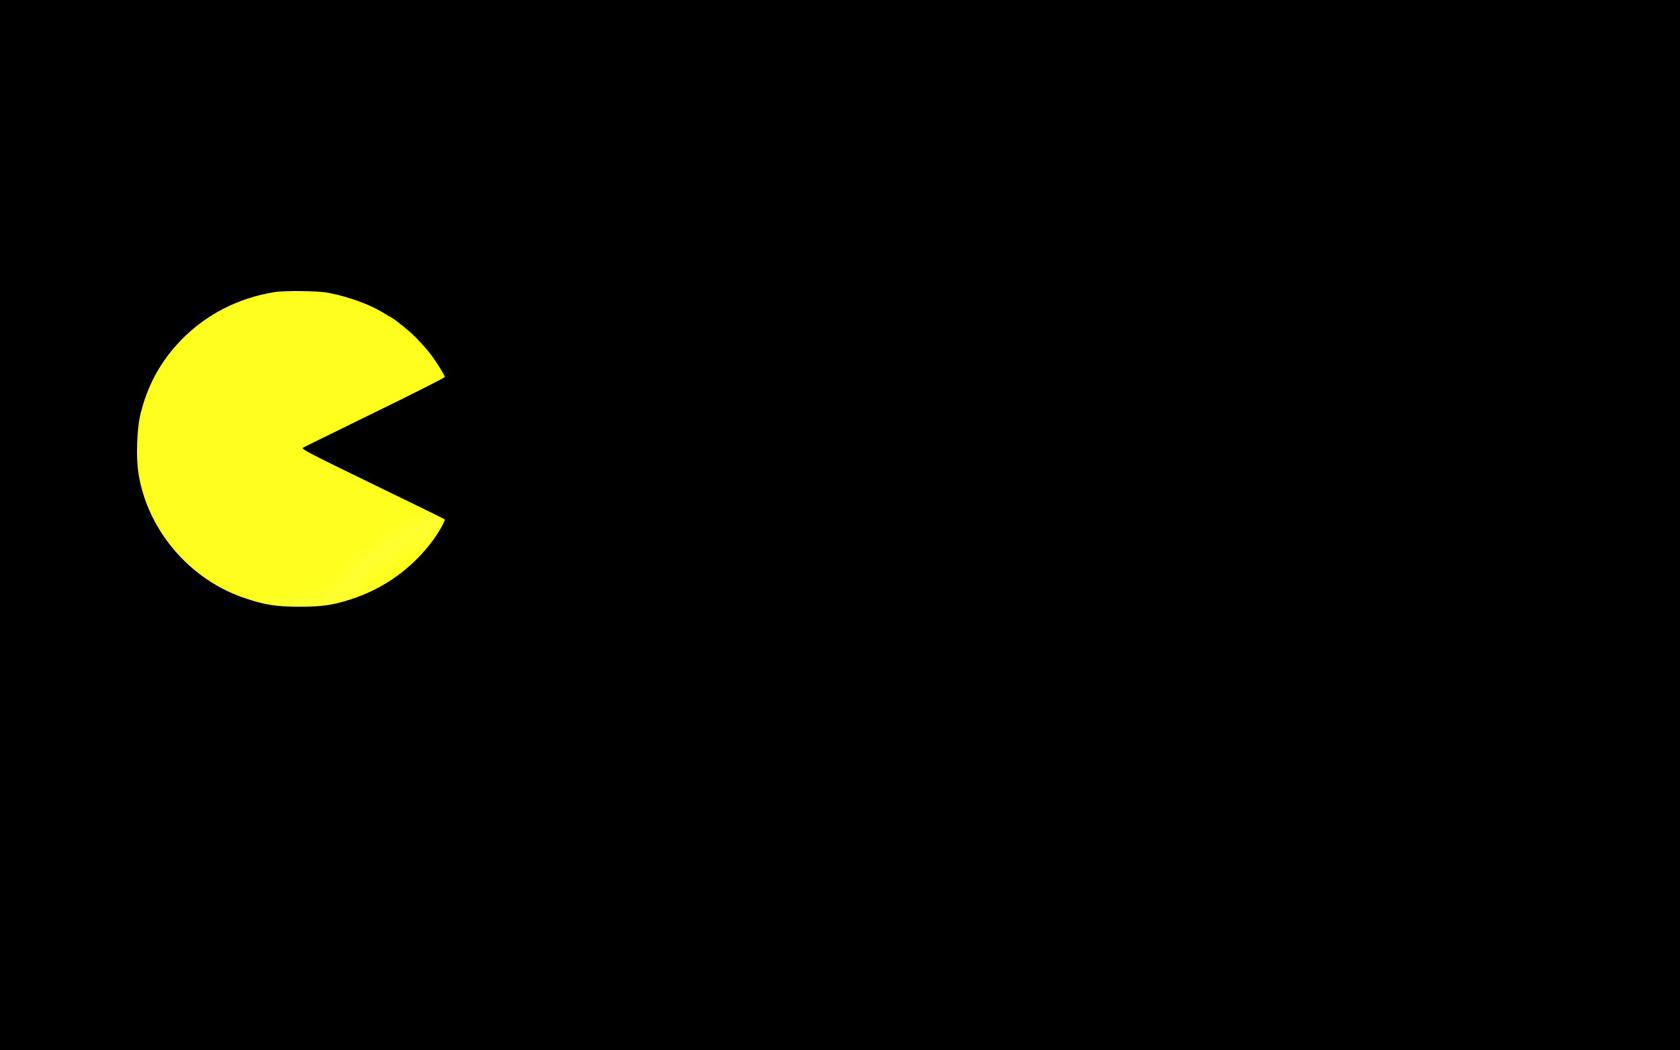 Pacman Archives Hdwallsource Com Hdwallsource Com HD Wallpapers Download Free Images Wallpaper [1000image.com]